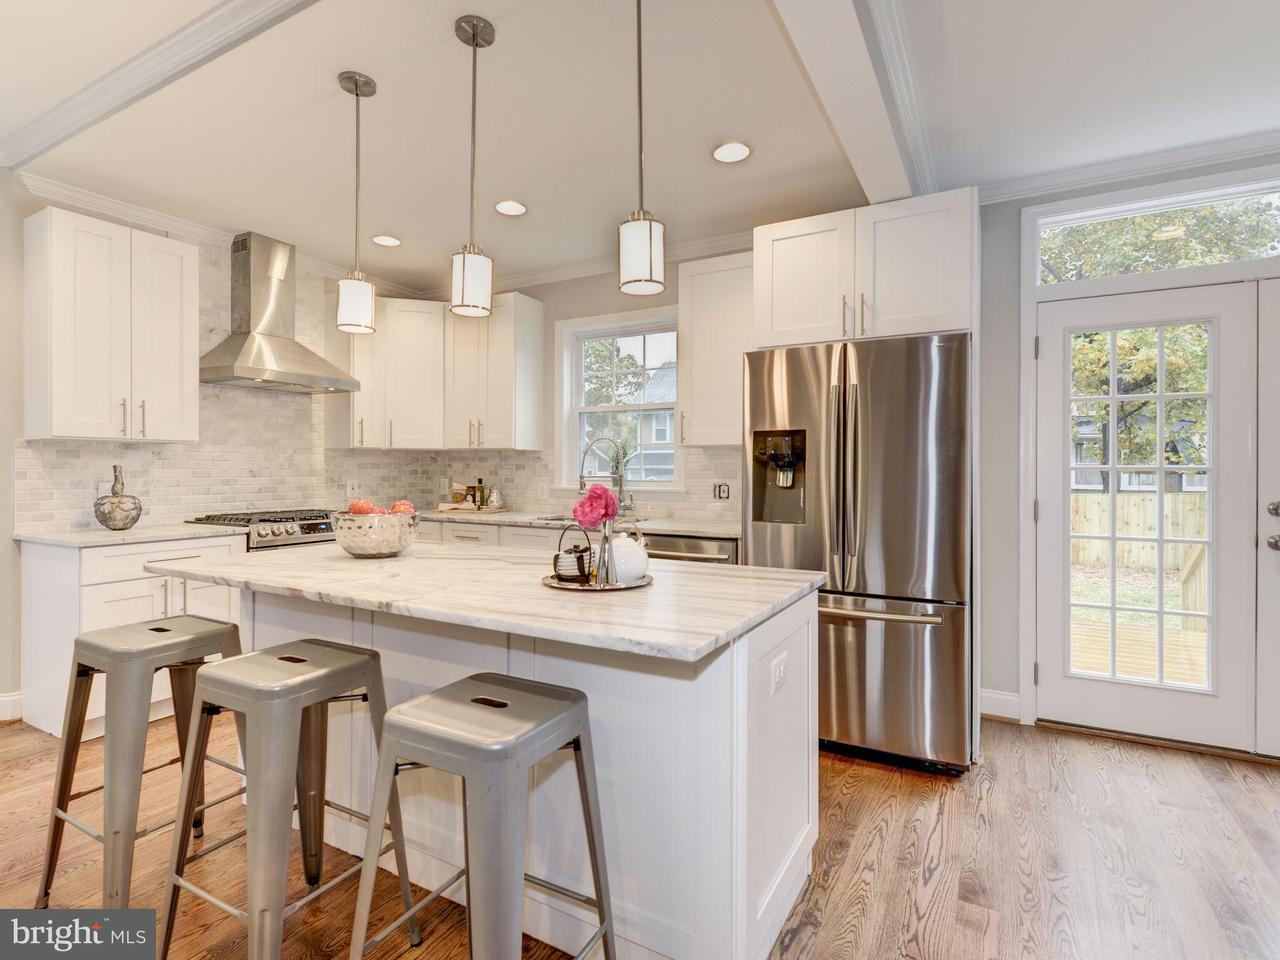 Additional photo for property listing at 2651 RHODE ISLAND AVE NE 2651 RHODE ISLAND AVE NE Washington, District Of Columbia 20018 United States